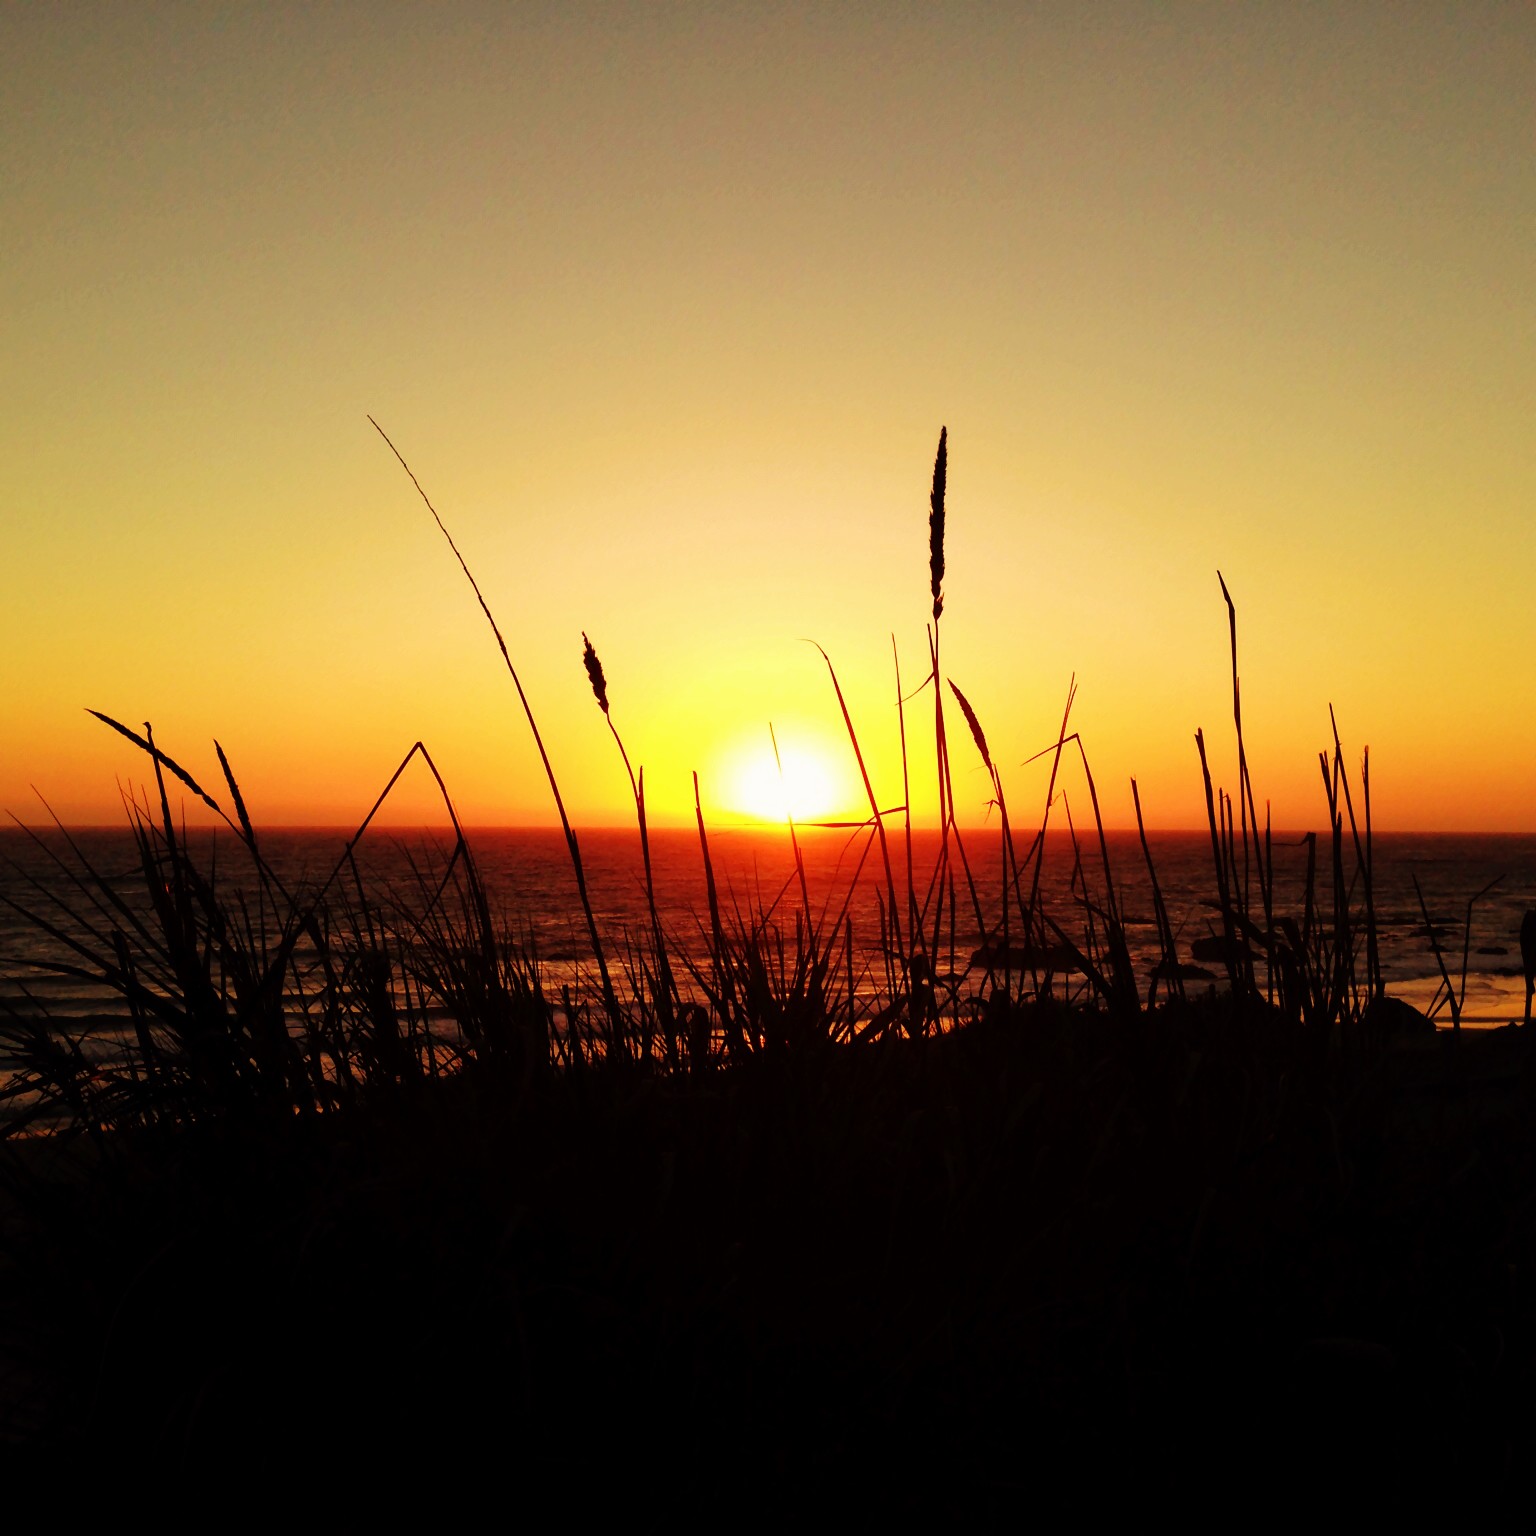 Sunset at Moonstone Beach, California